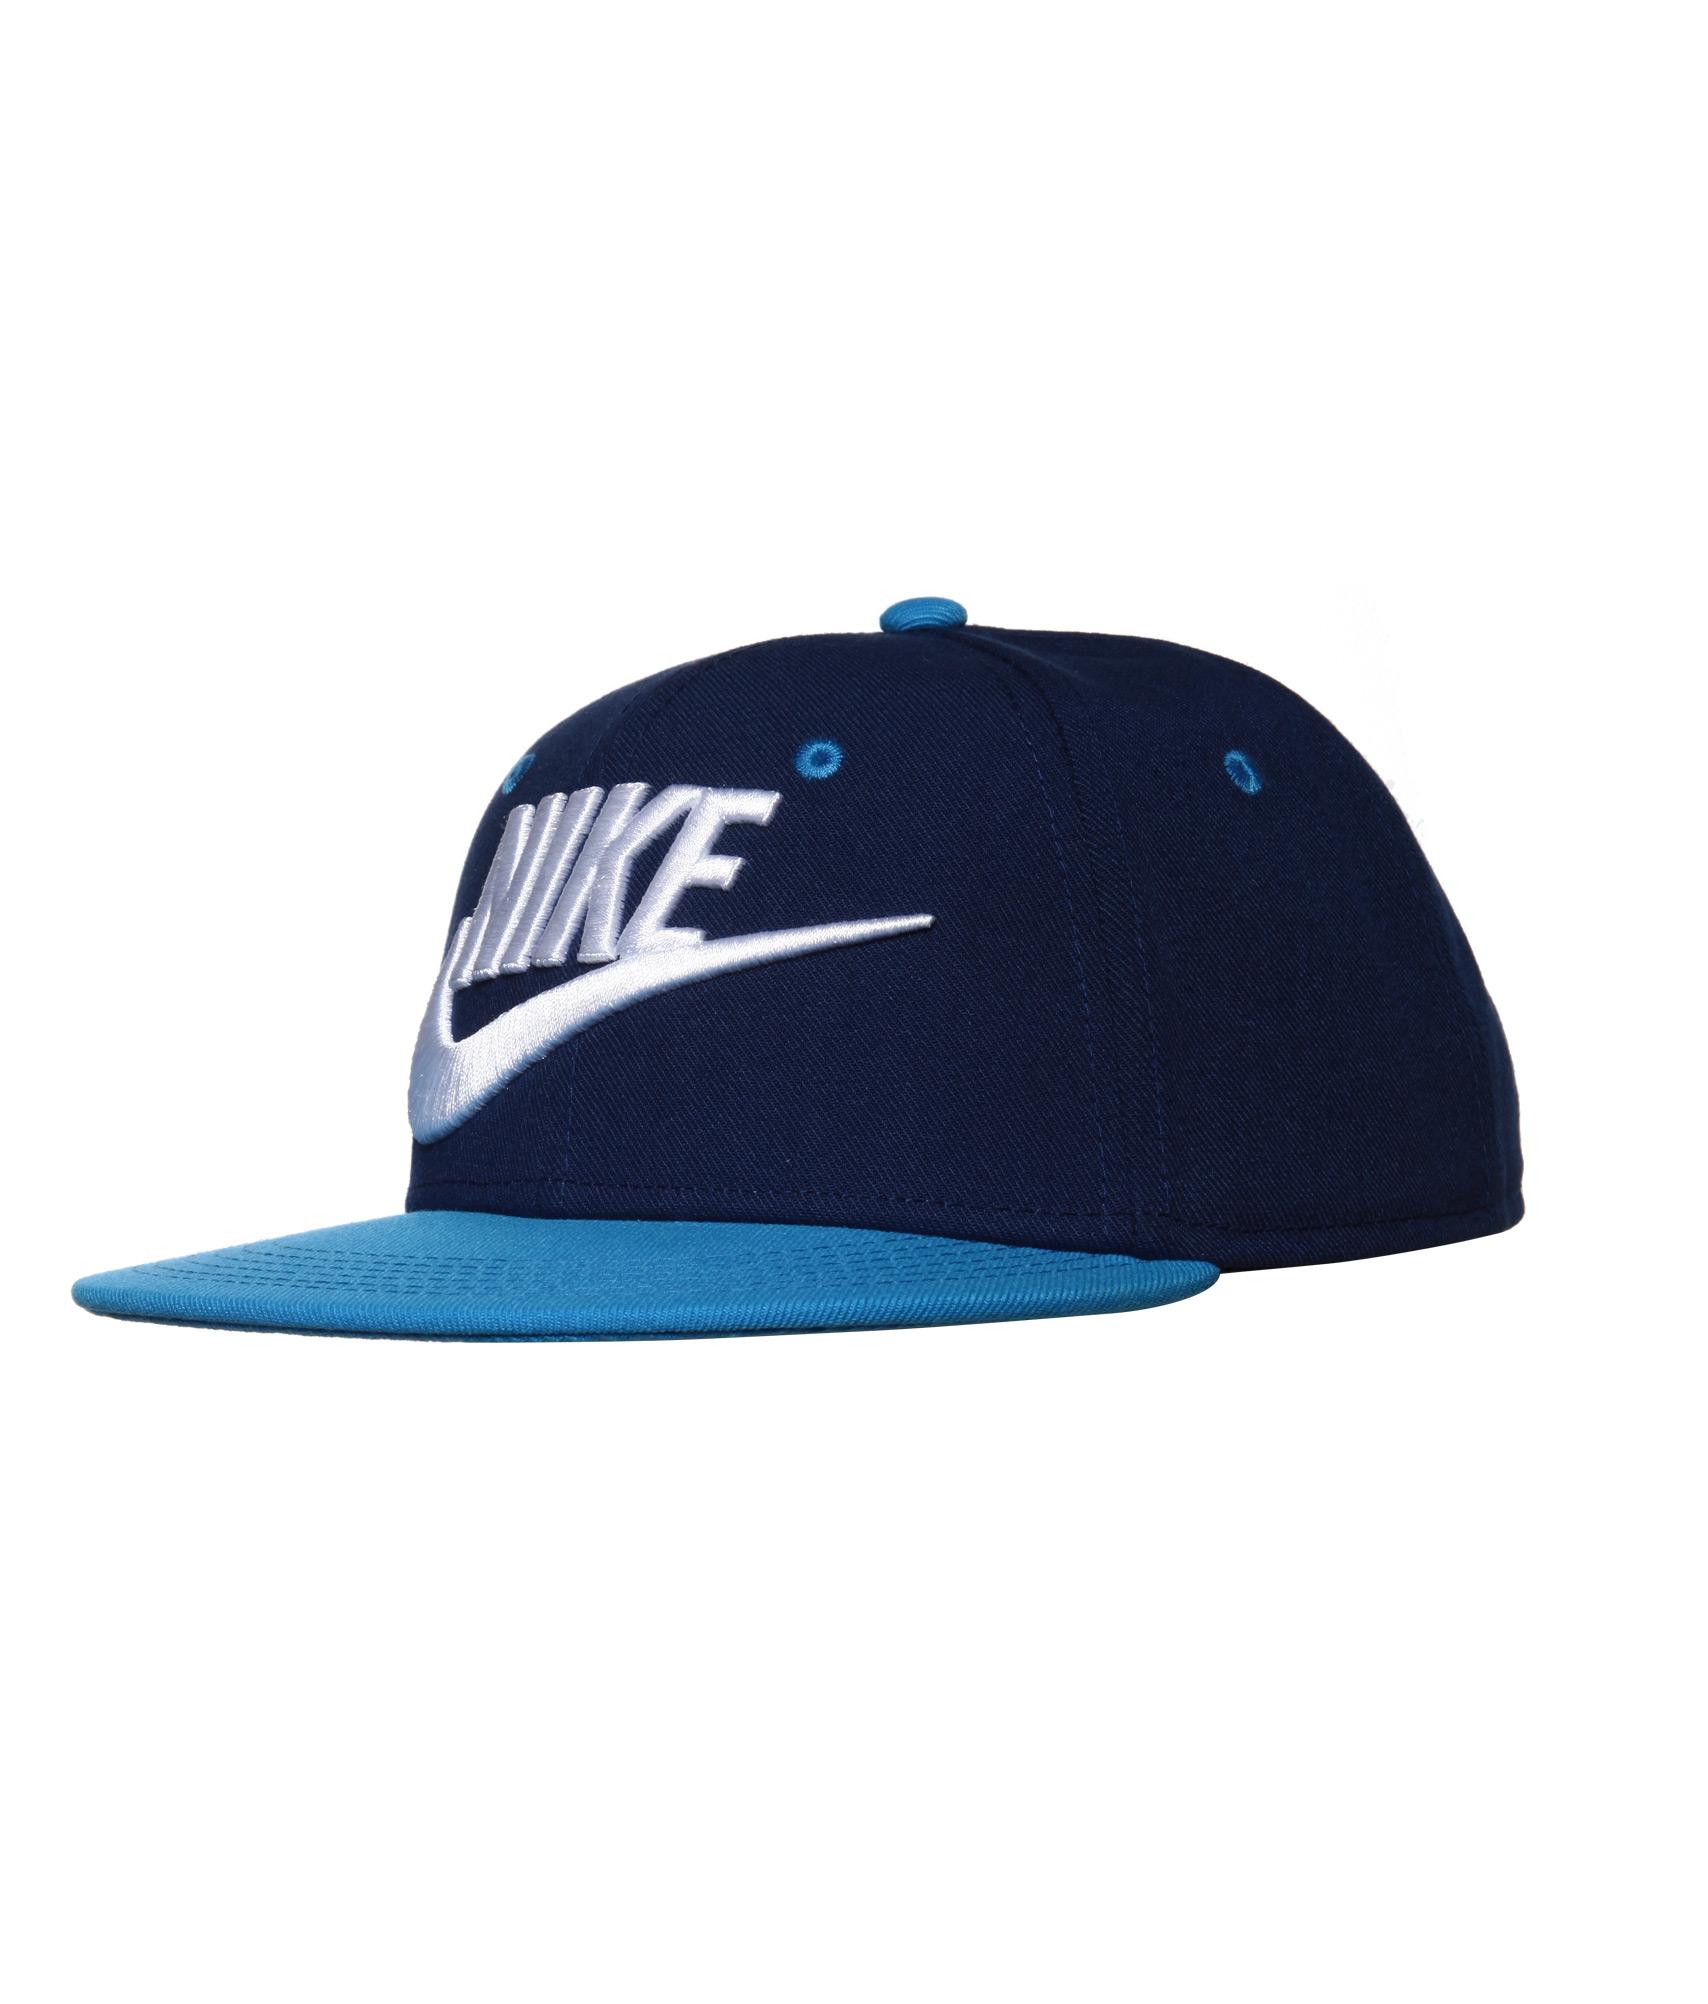 Бейсболка детская Nike Nike бейсболка nike run aw84 651659 413